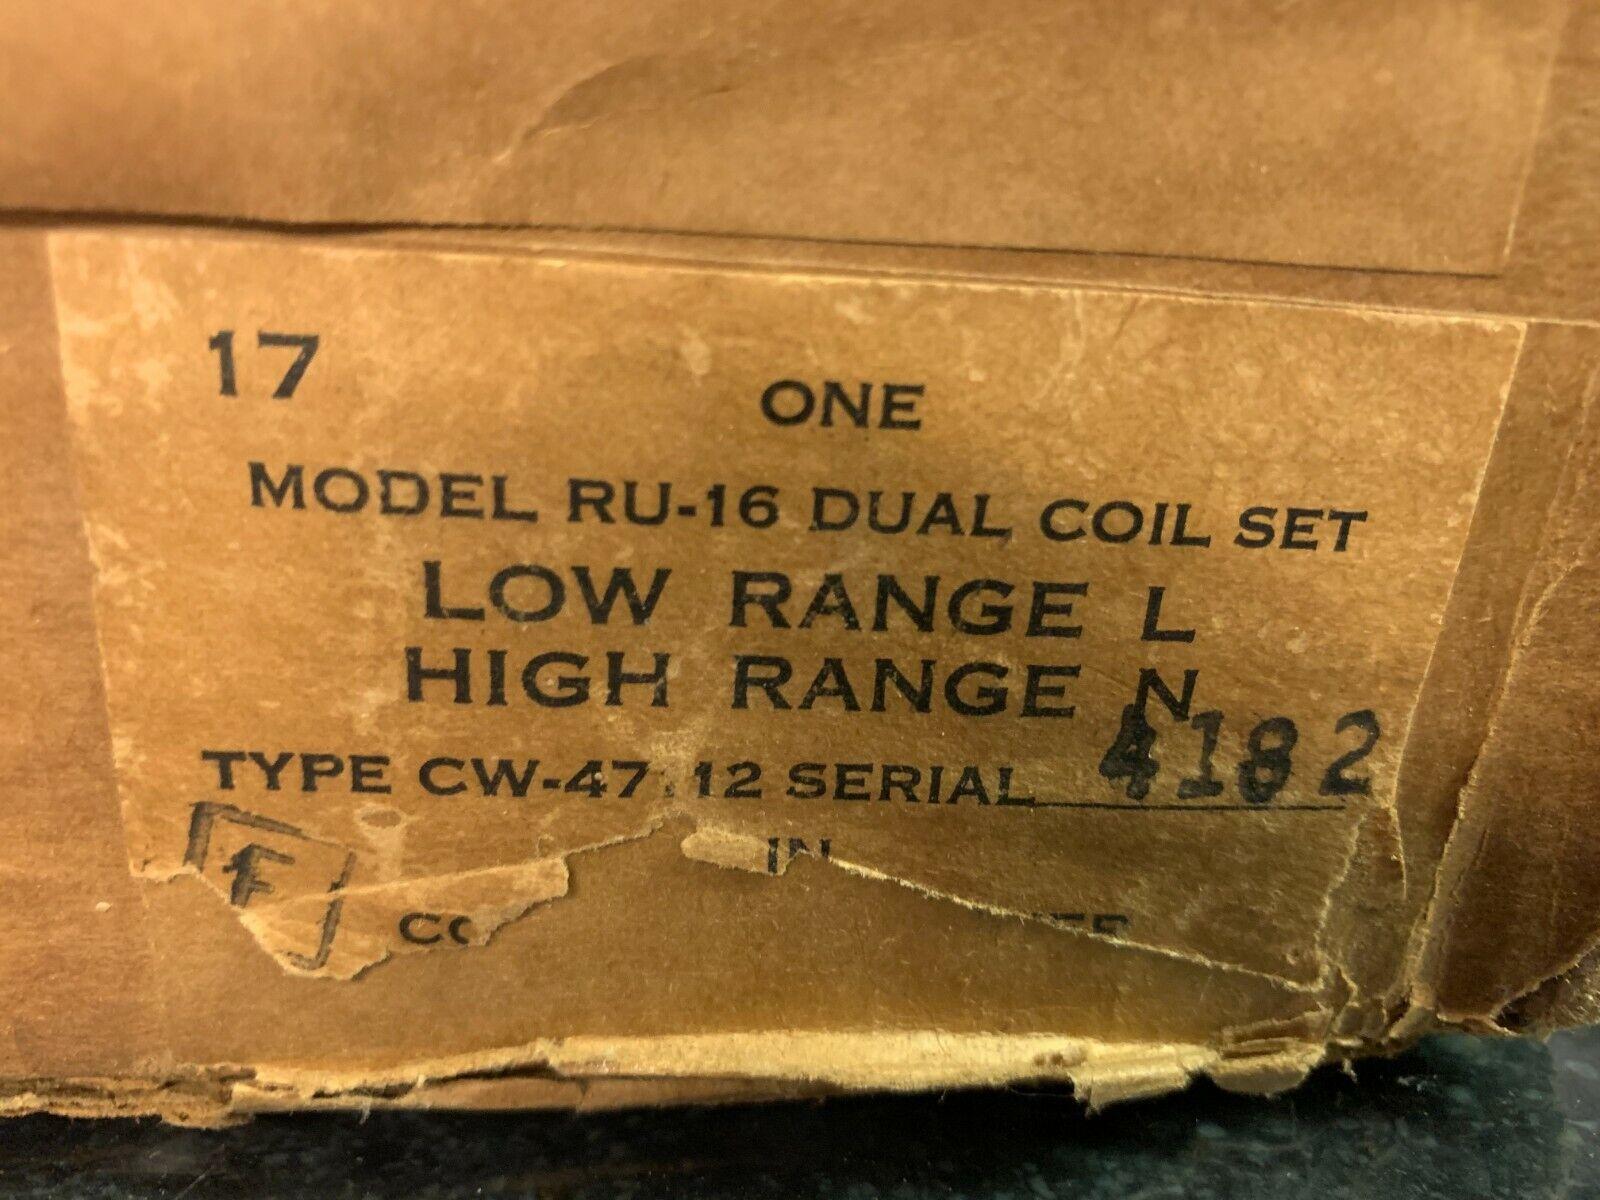 NOS RU-16 Dual Band Low Range L High Range N Coil Set For RU- Series Receivers - $9.95